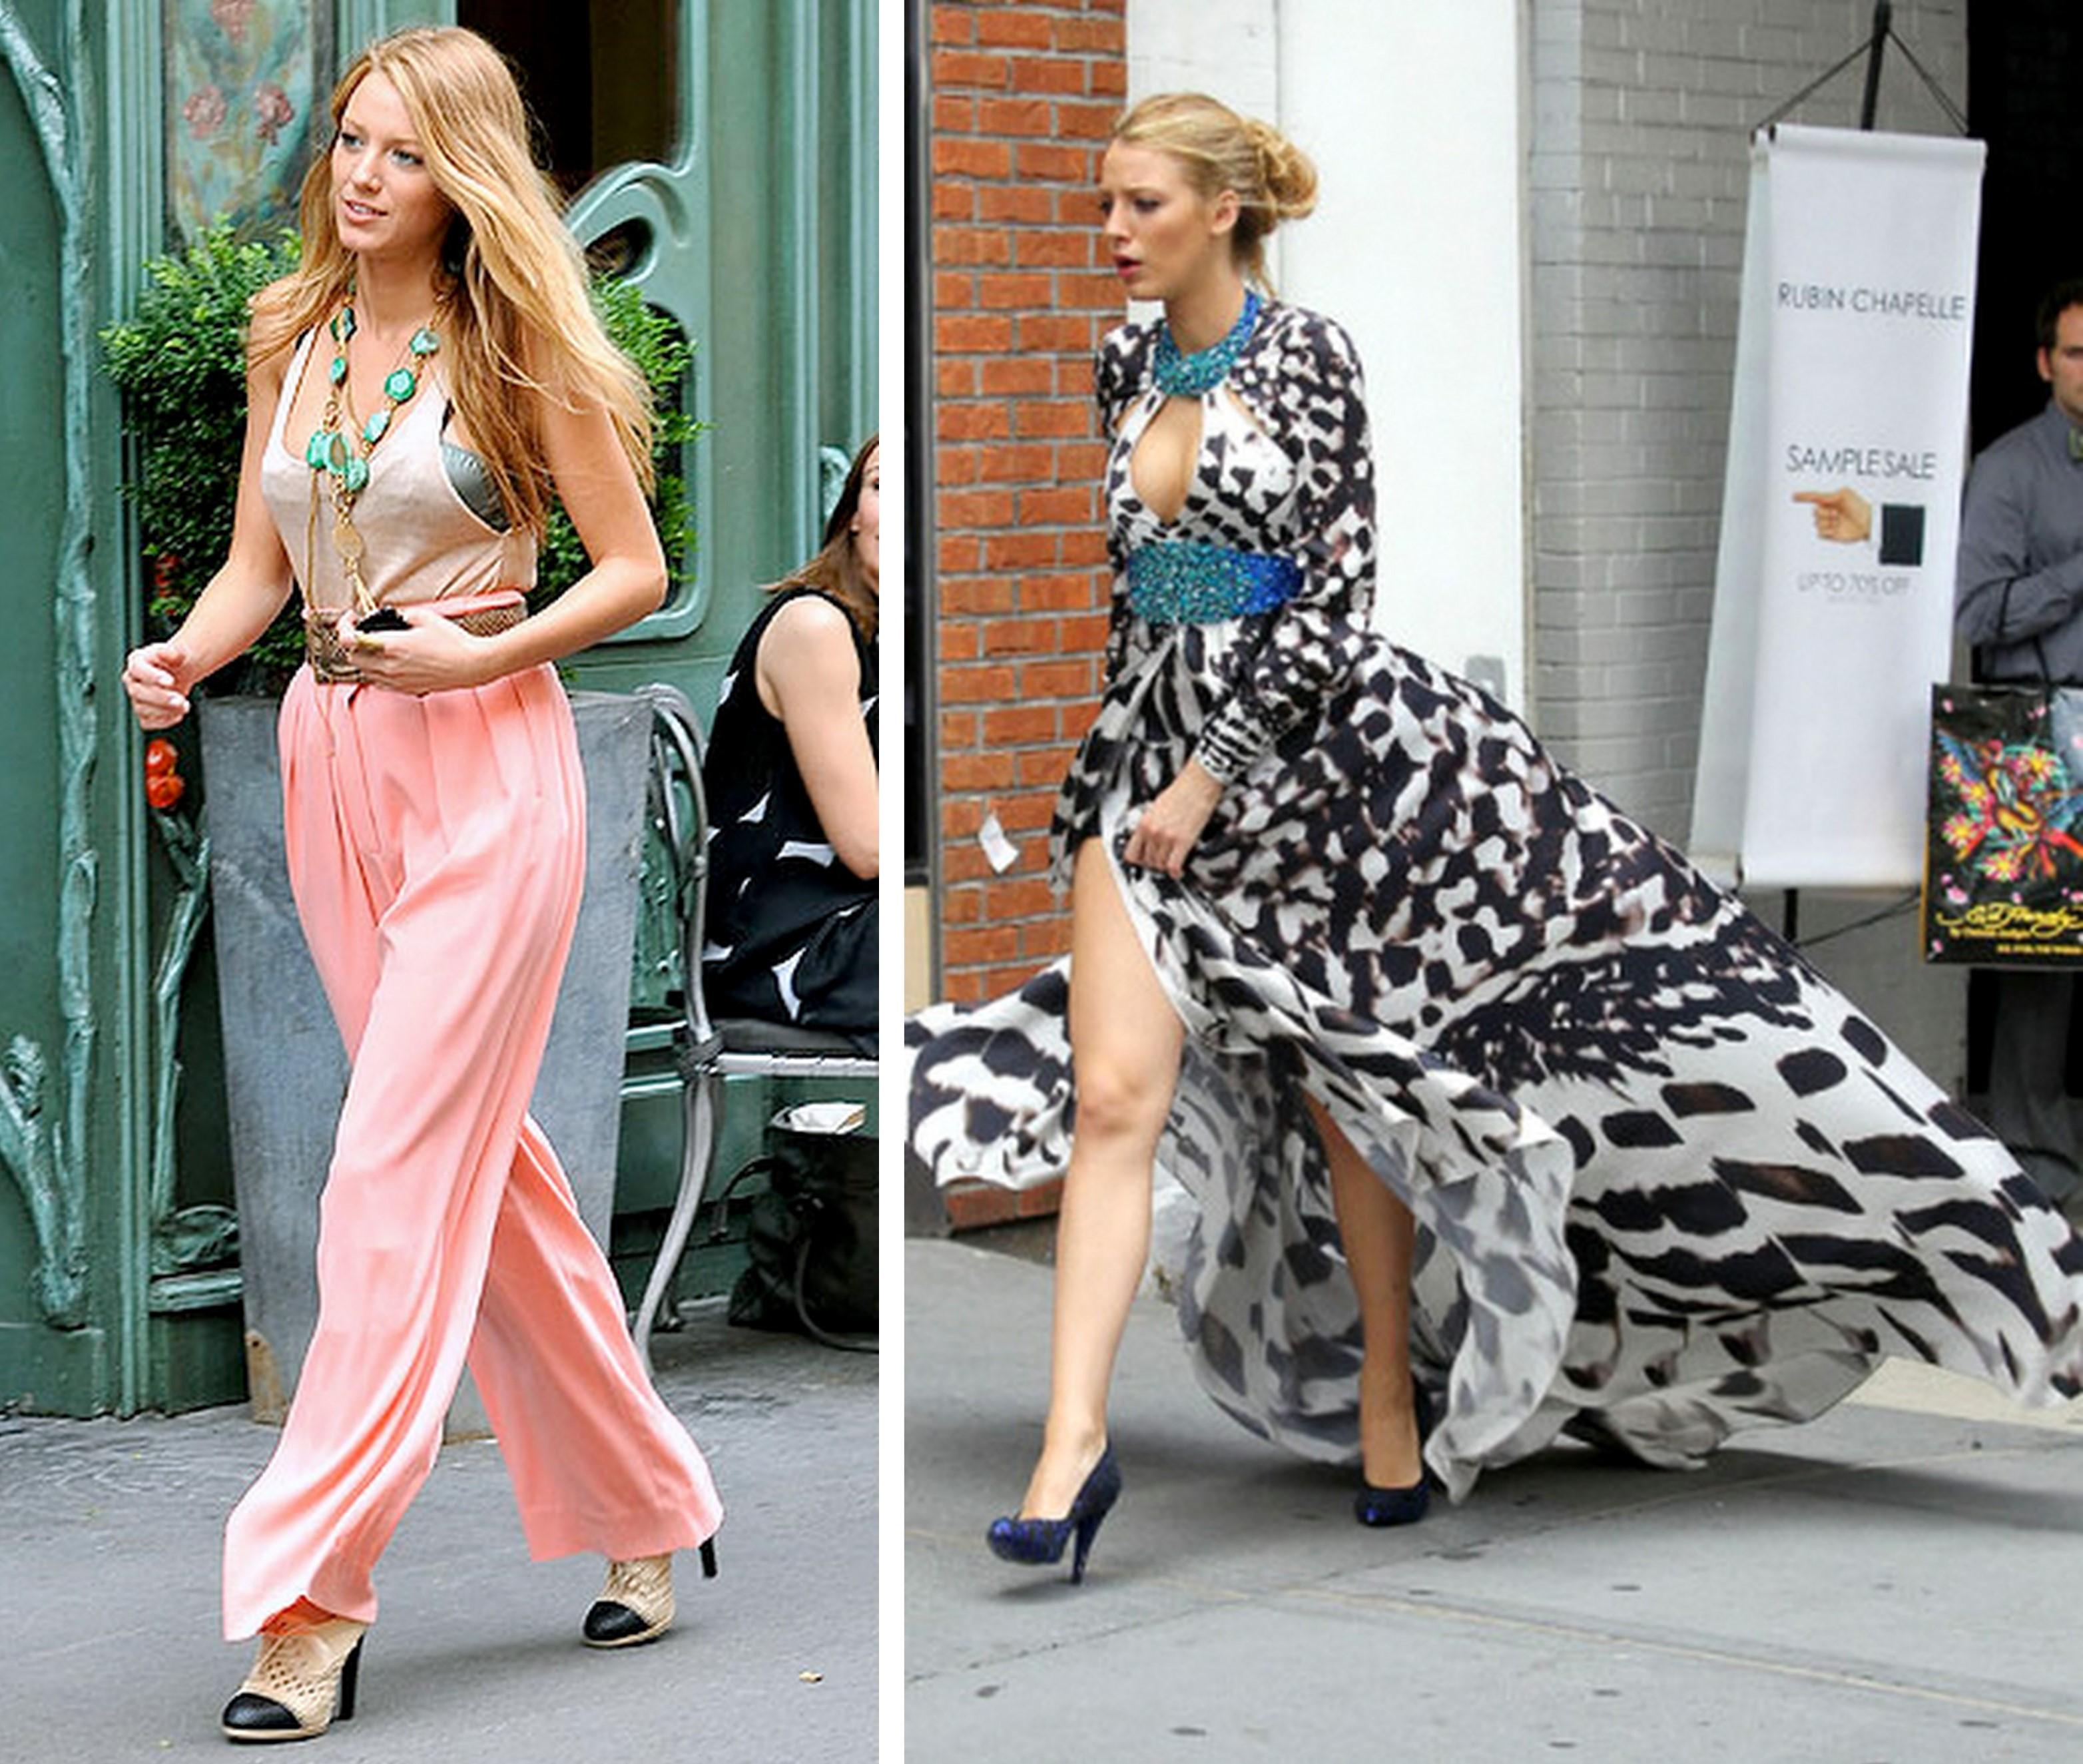 Gossip Girl Fashion WornOnTV Clothes and